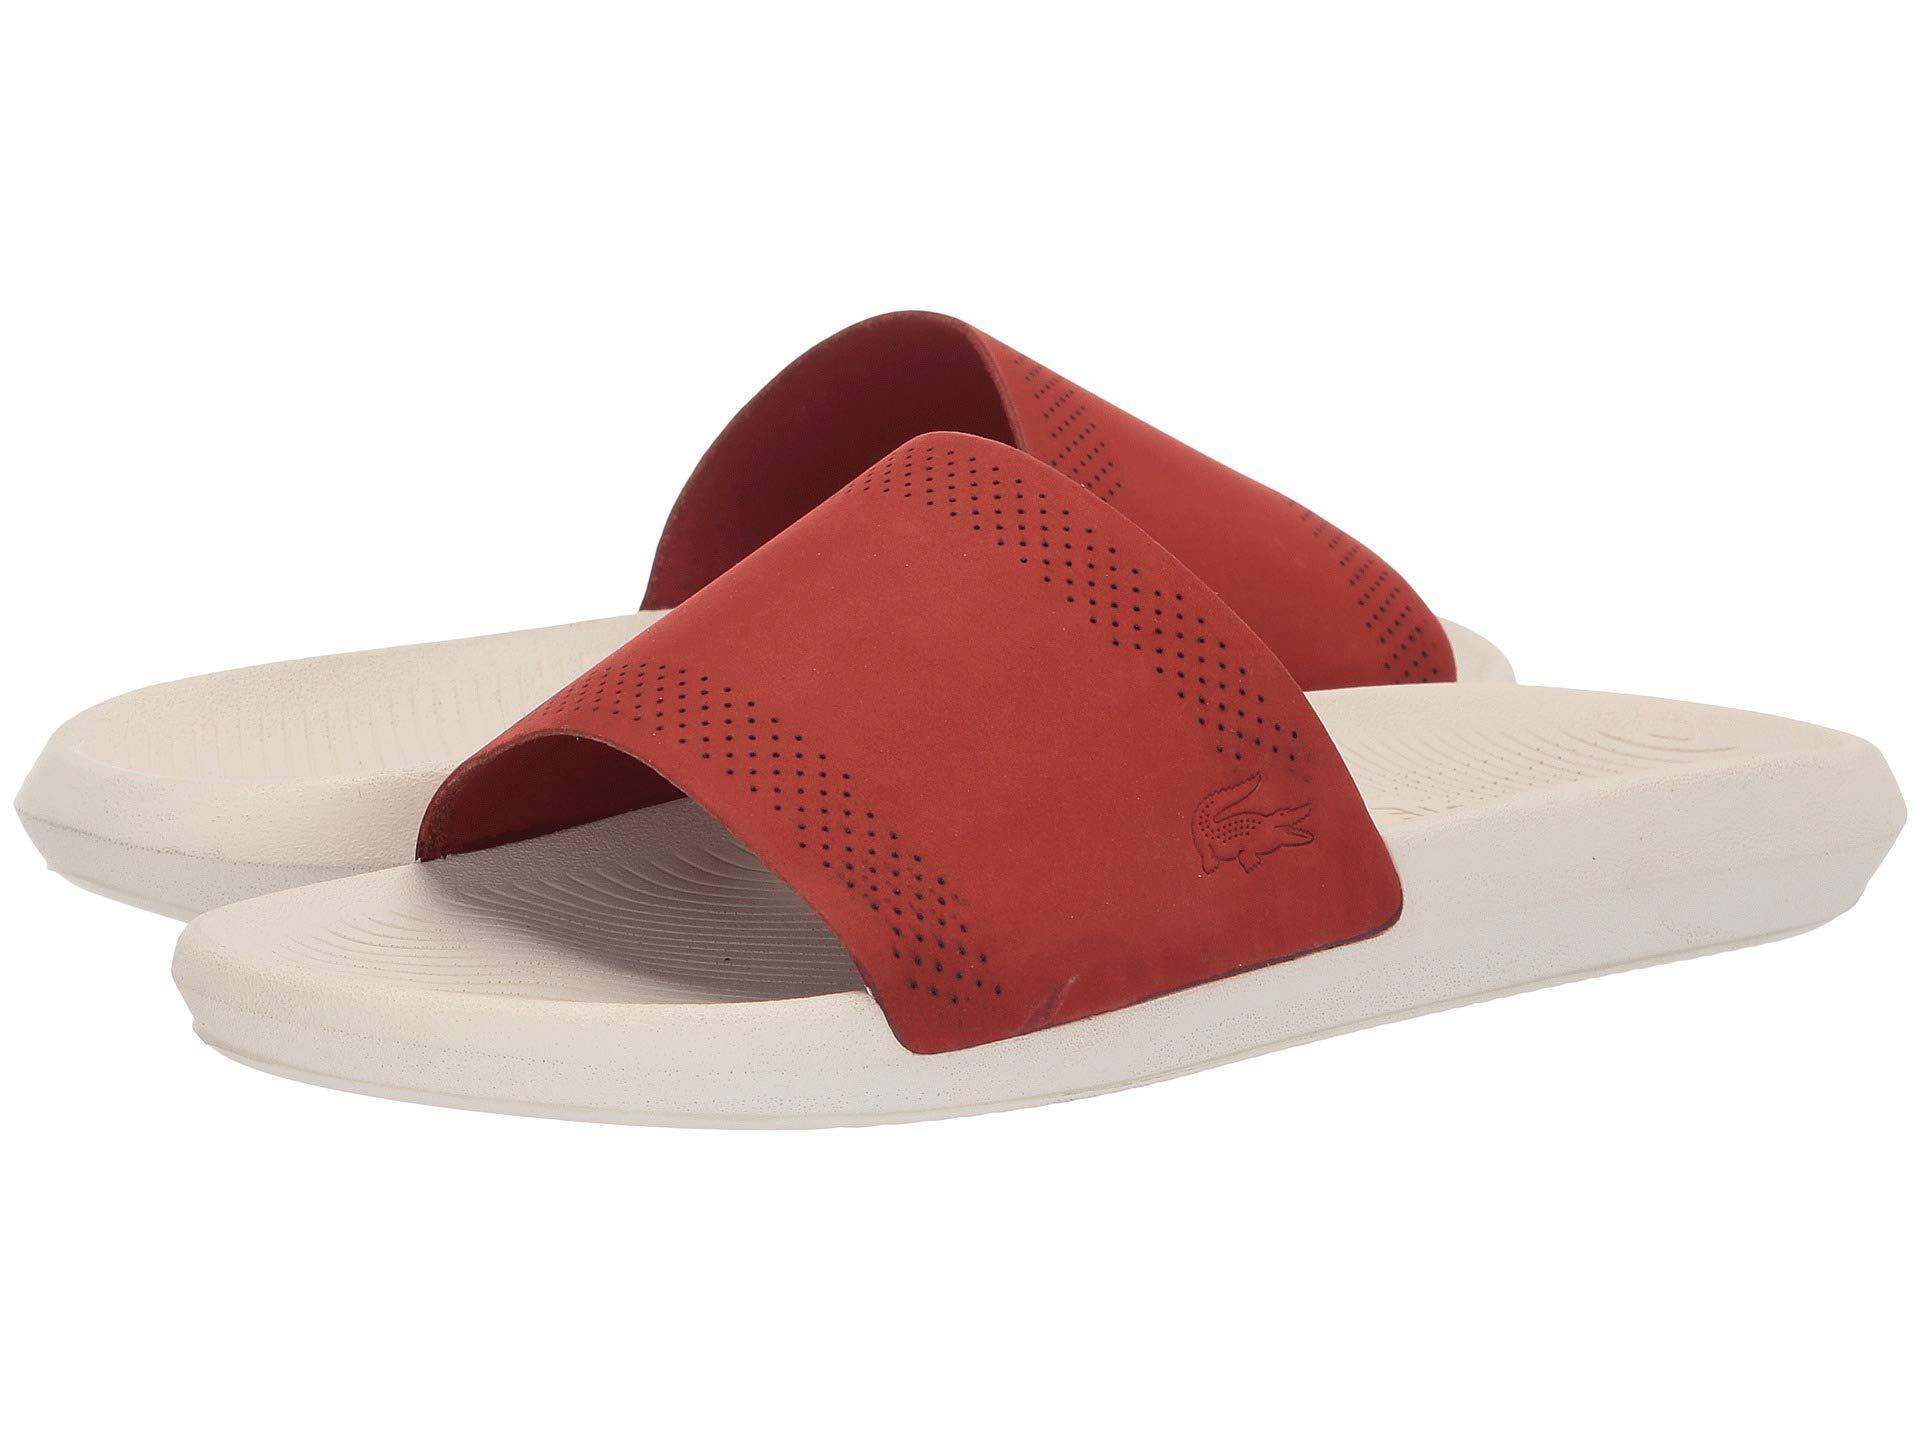 afde4216c Lyst - Lacoste Croco Slide 119 5 (navy off-white) Men s Shoes for Men